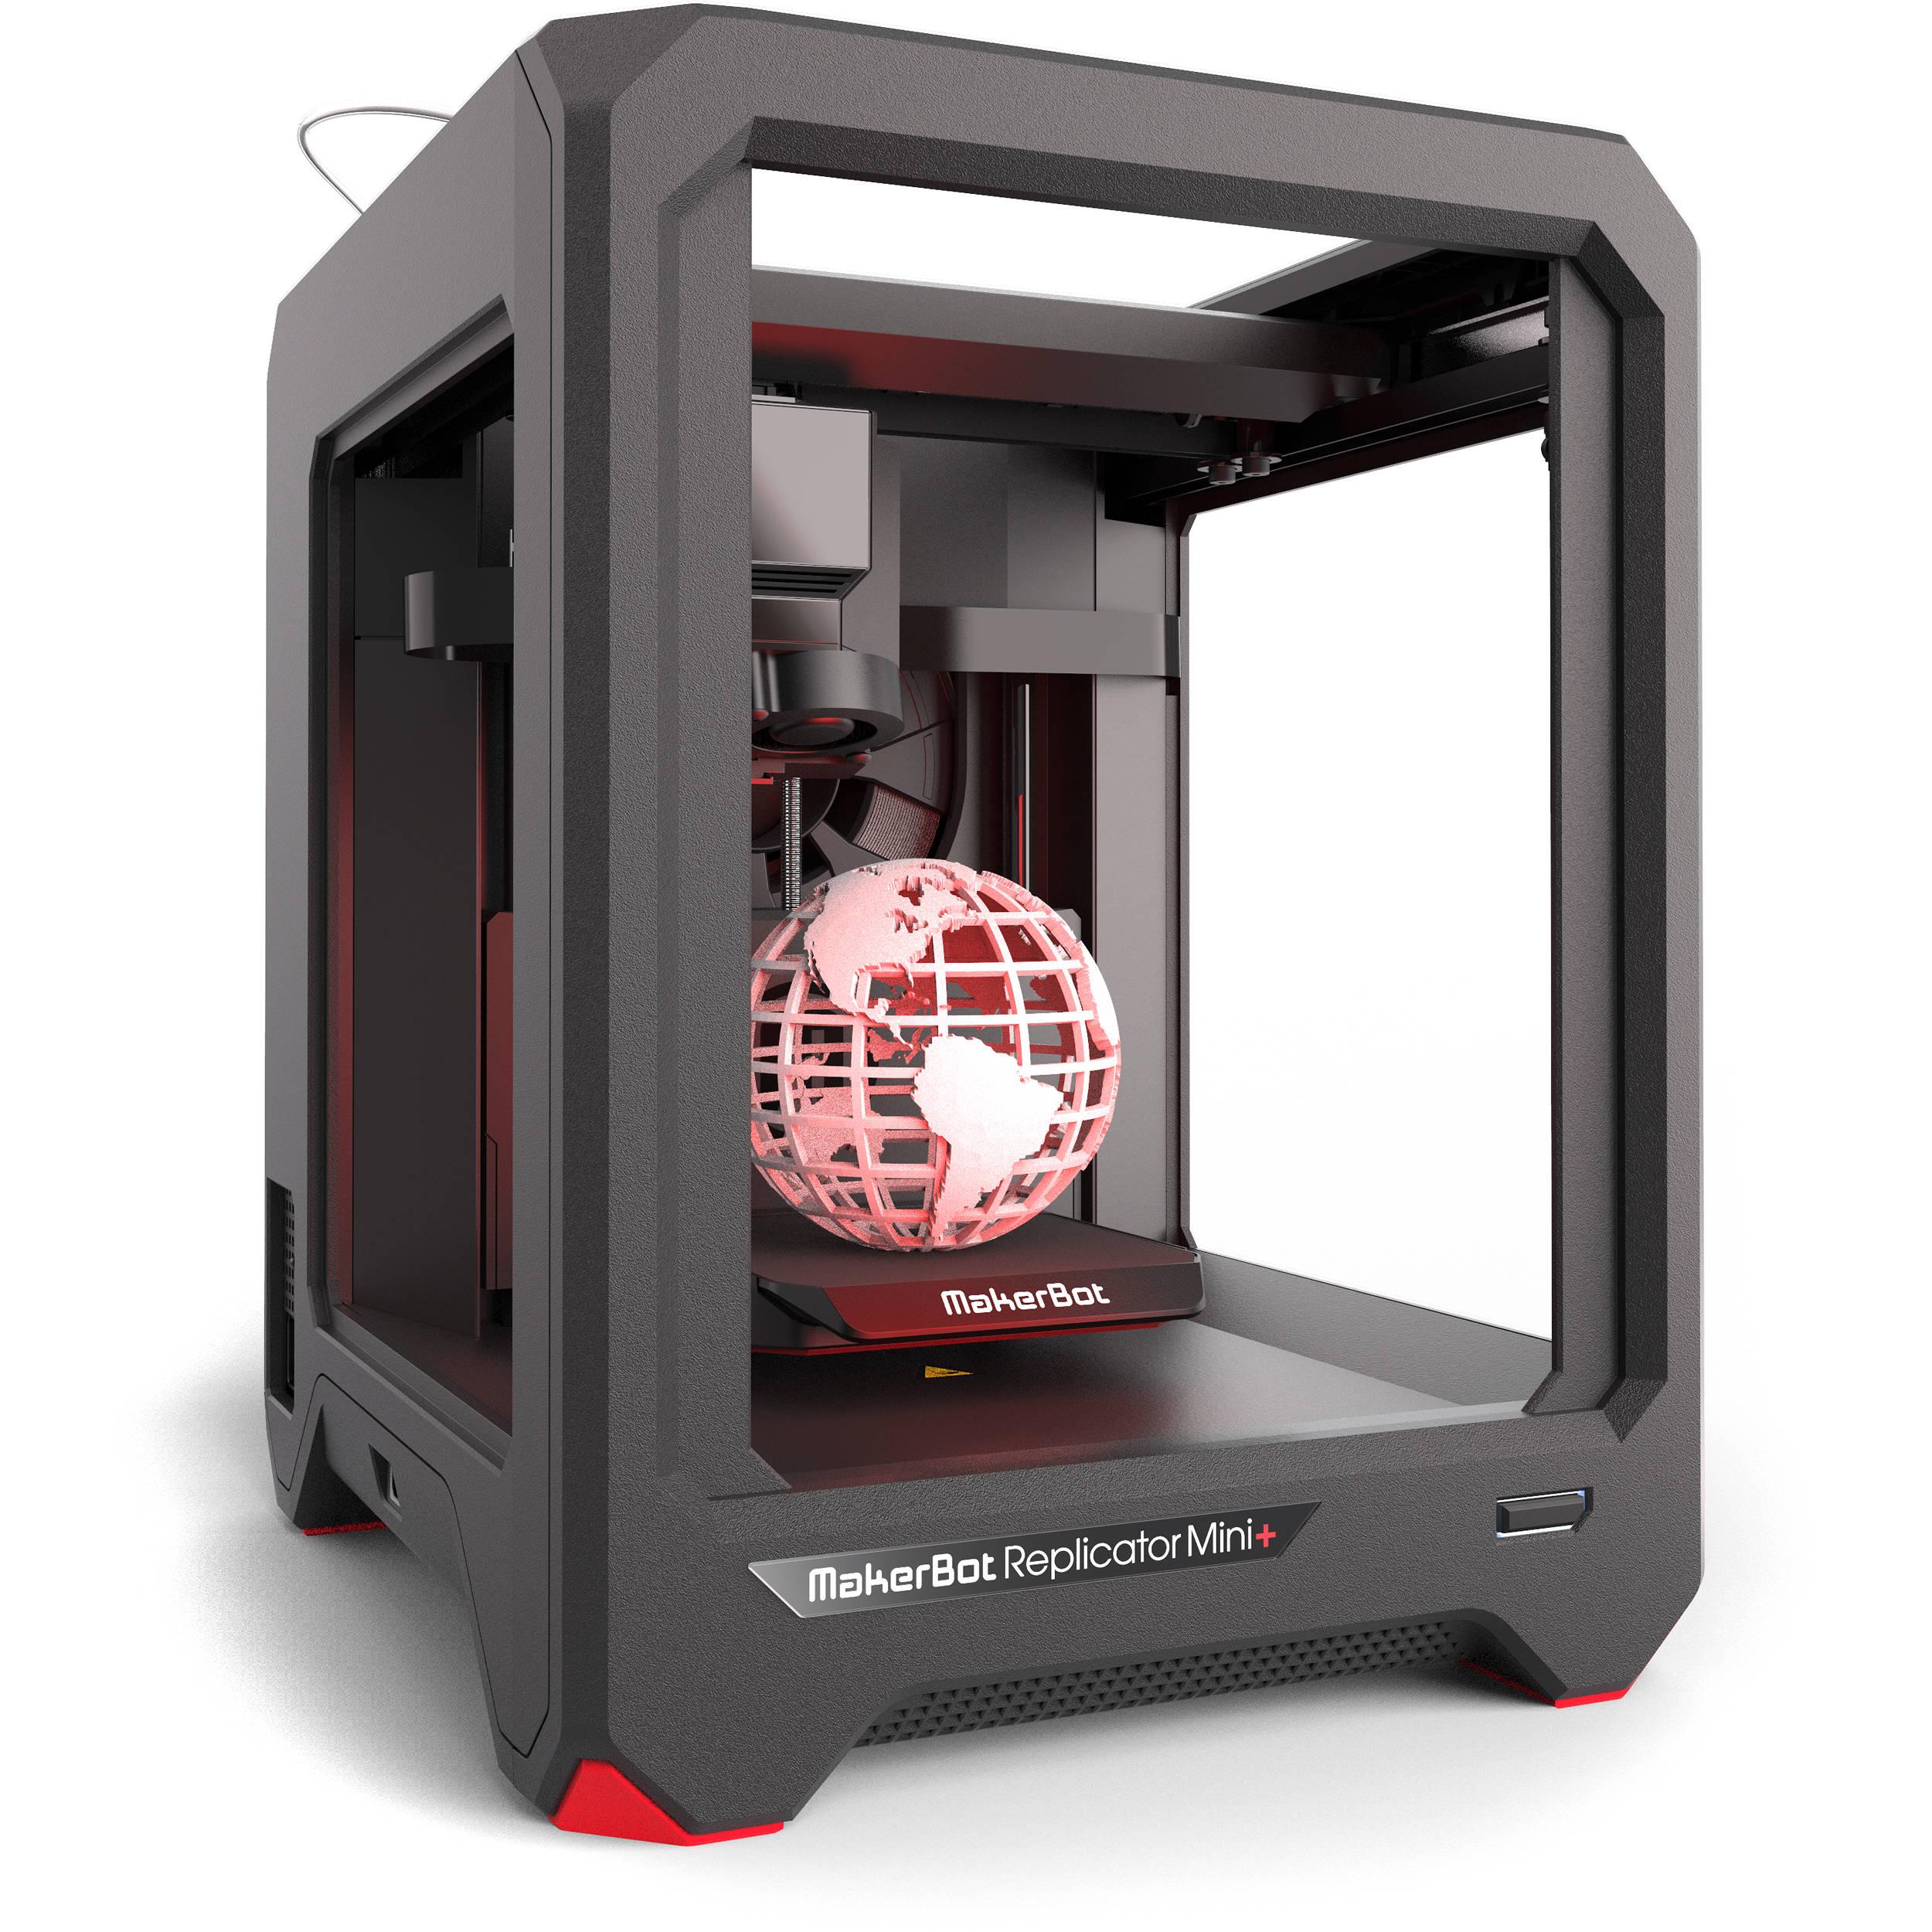 makerbot replicator mini 3d printer mp07925 b h photo video. Black Bedroom Furniture Sets. Home Design Ideas